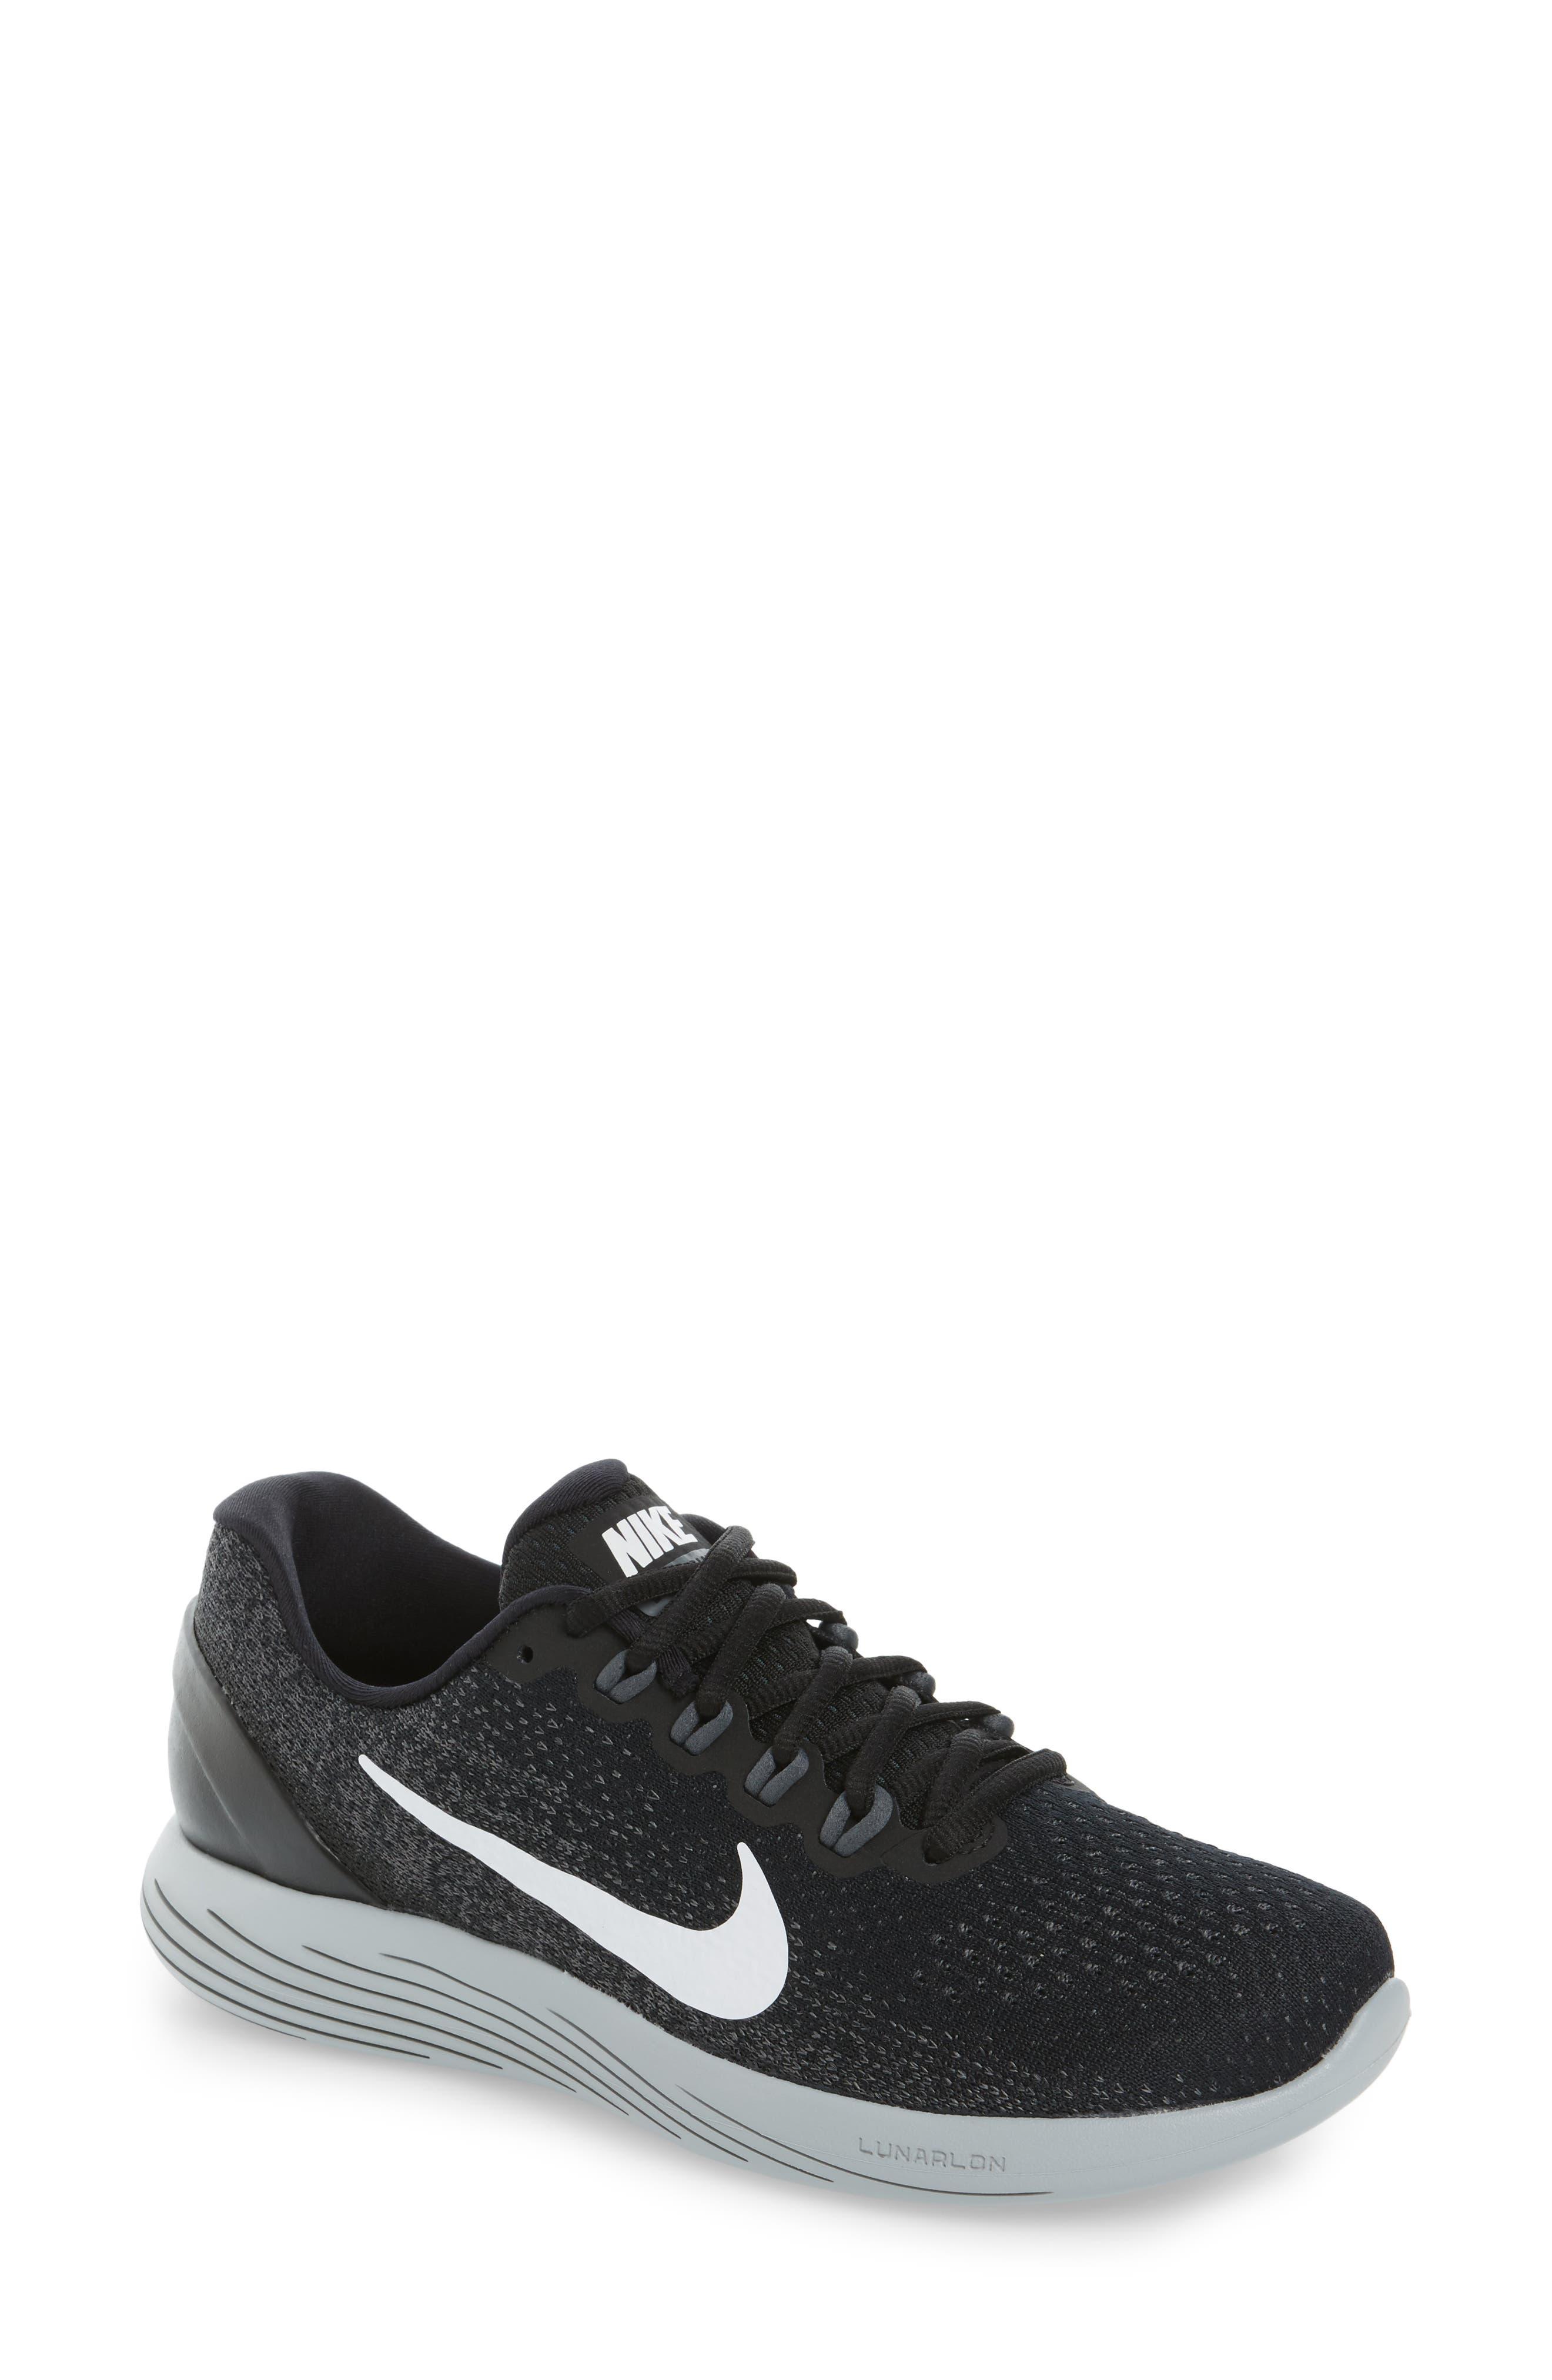 LunarGlide 9 Running Shoe,                         Main,                         color, 001